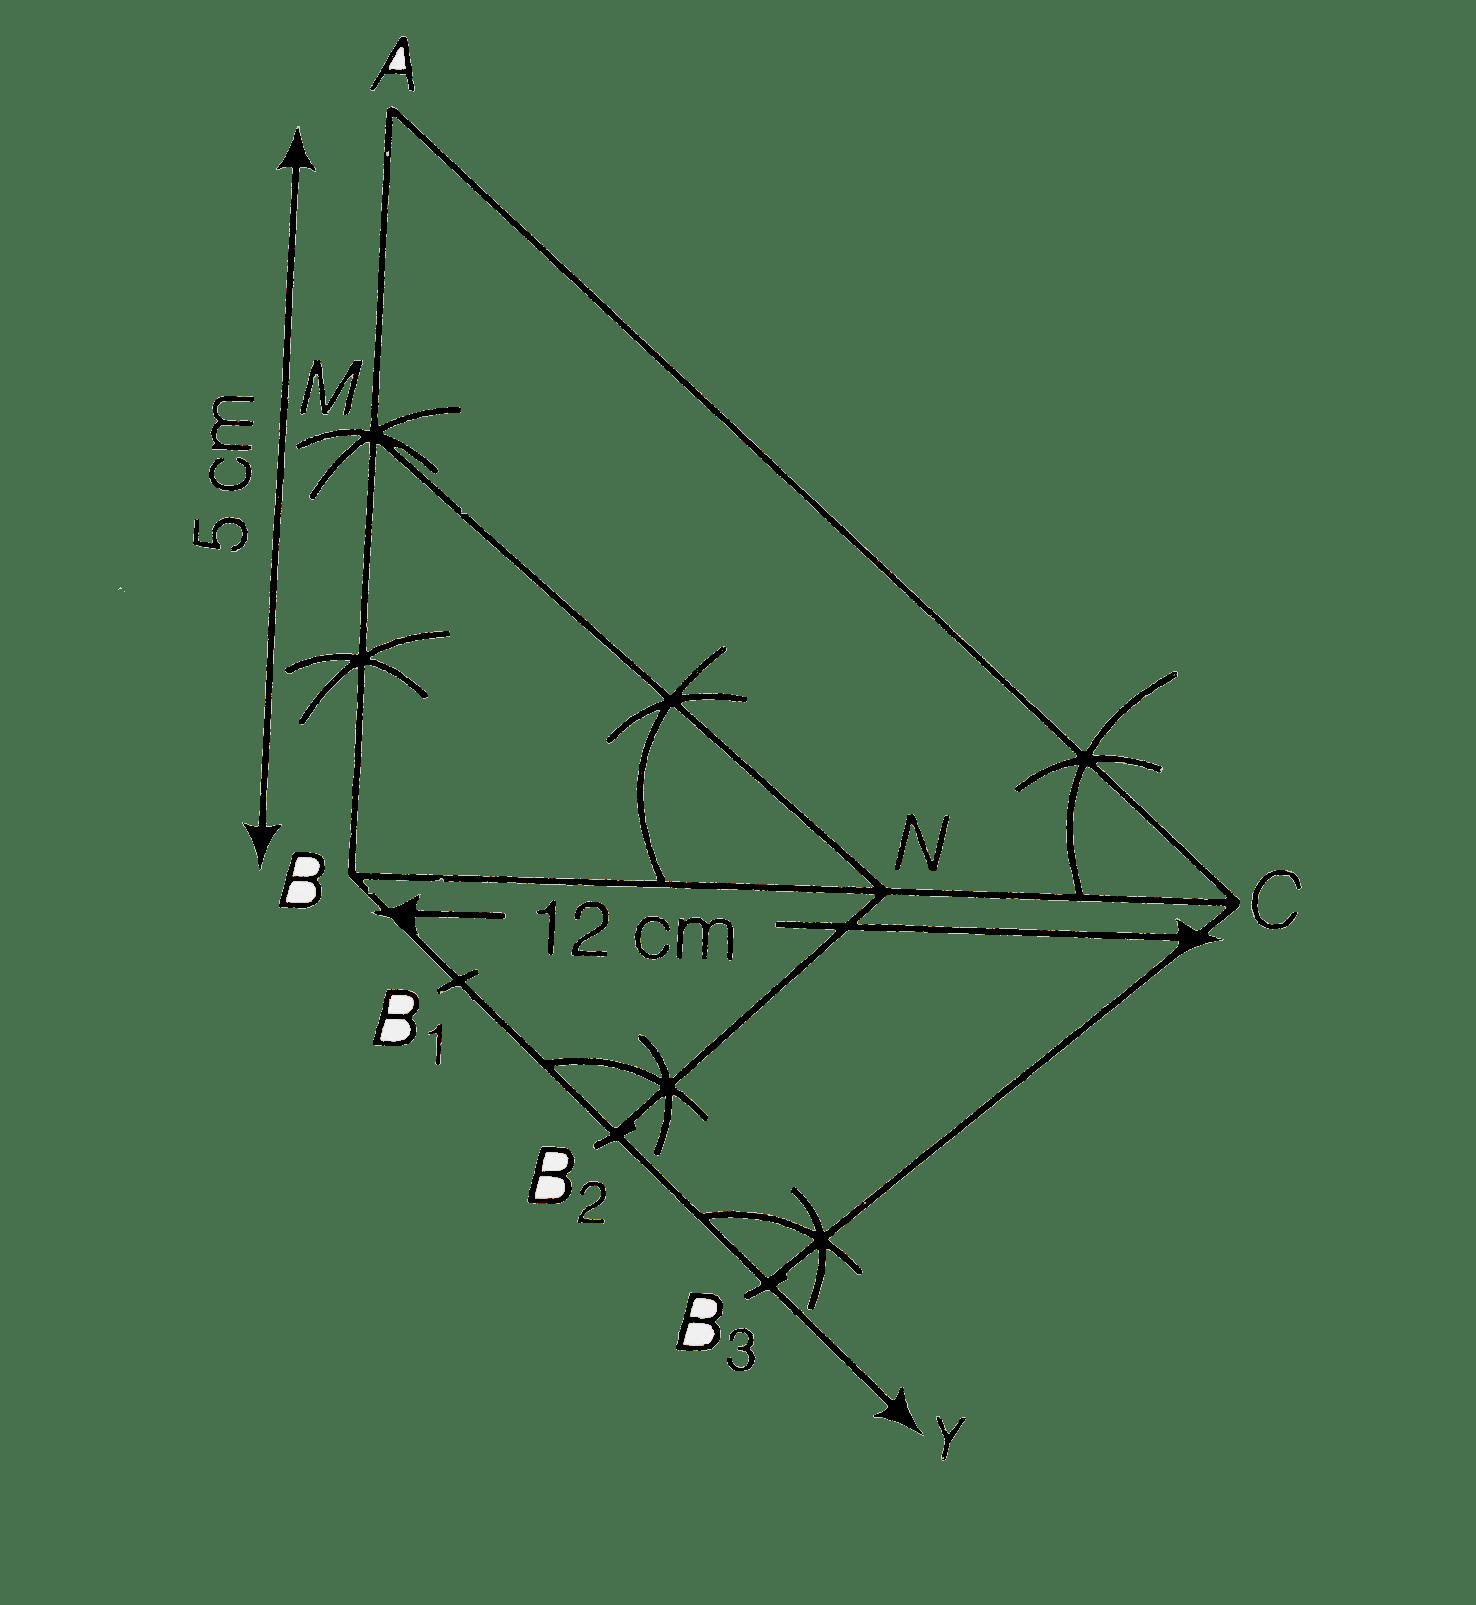 which bc 12 cm ab 5 cm